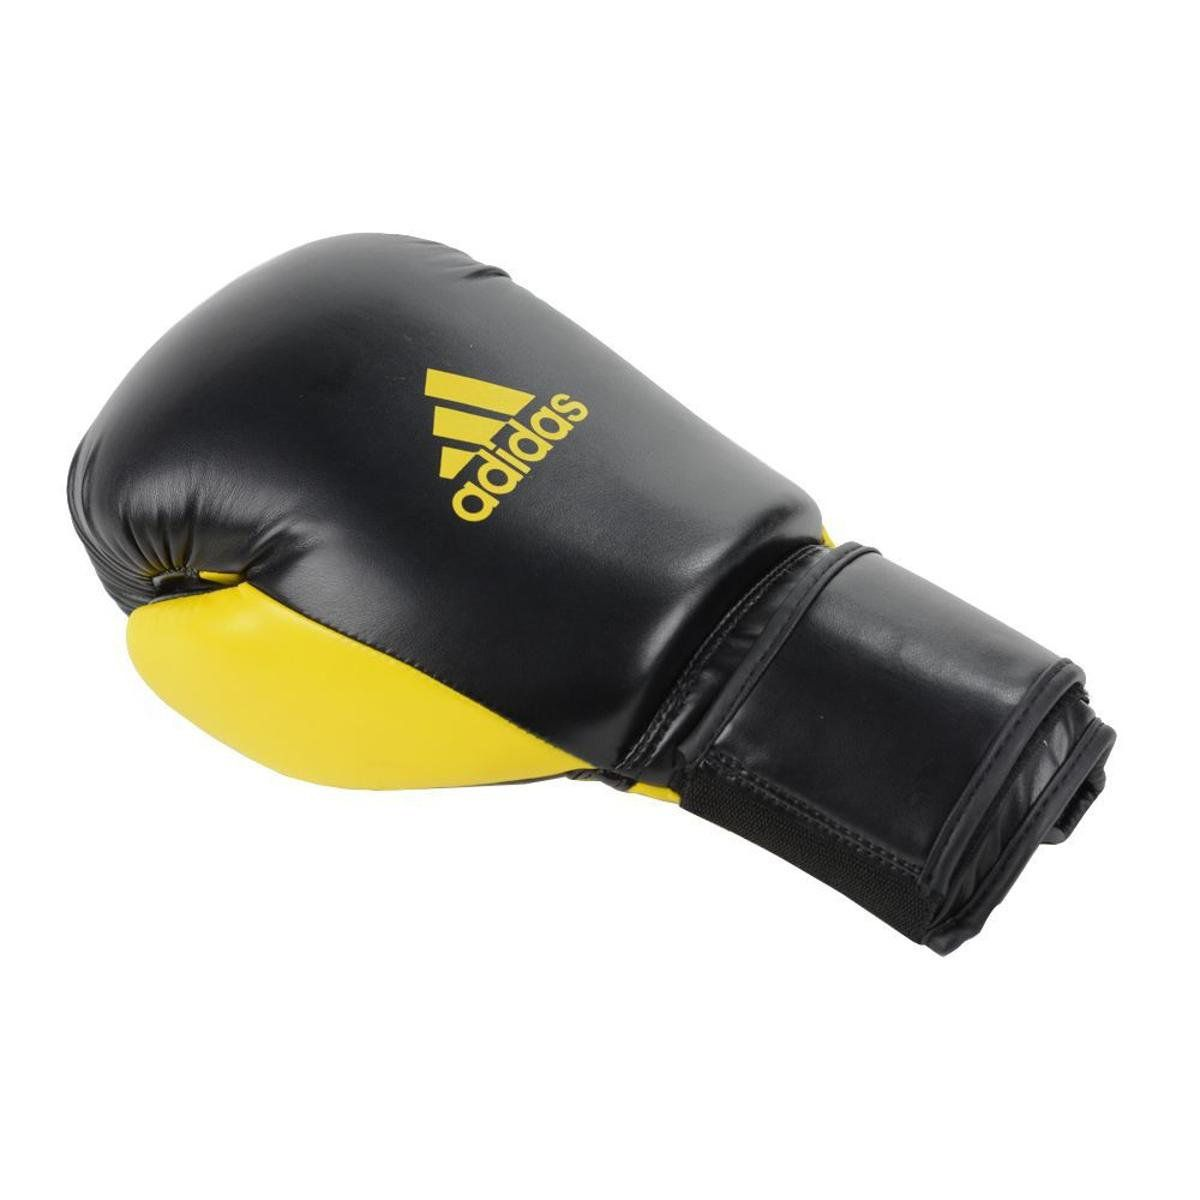 Kit Luvas Boxe / Muay Thai - Adidas Power 100 - Preta / Amarelo - 10/12/14 OZ  - Loja do Competidor